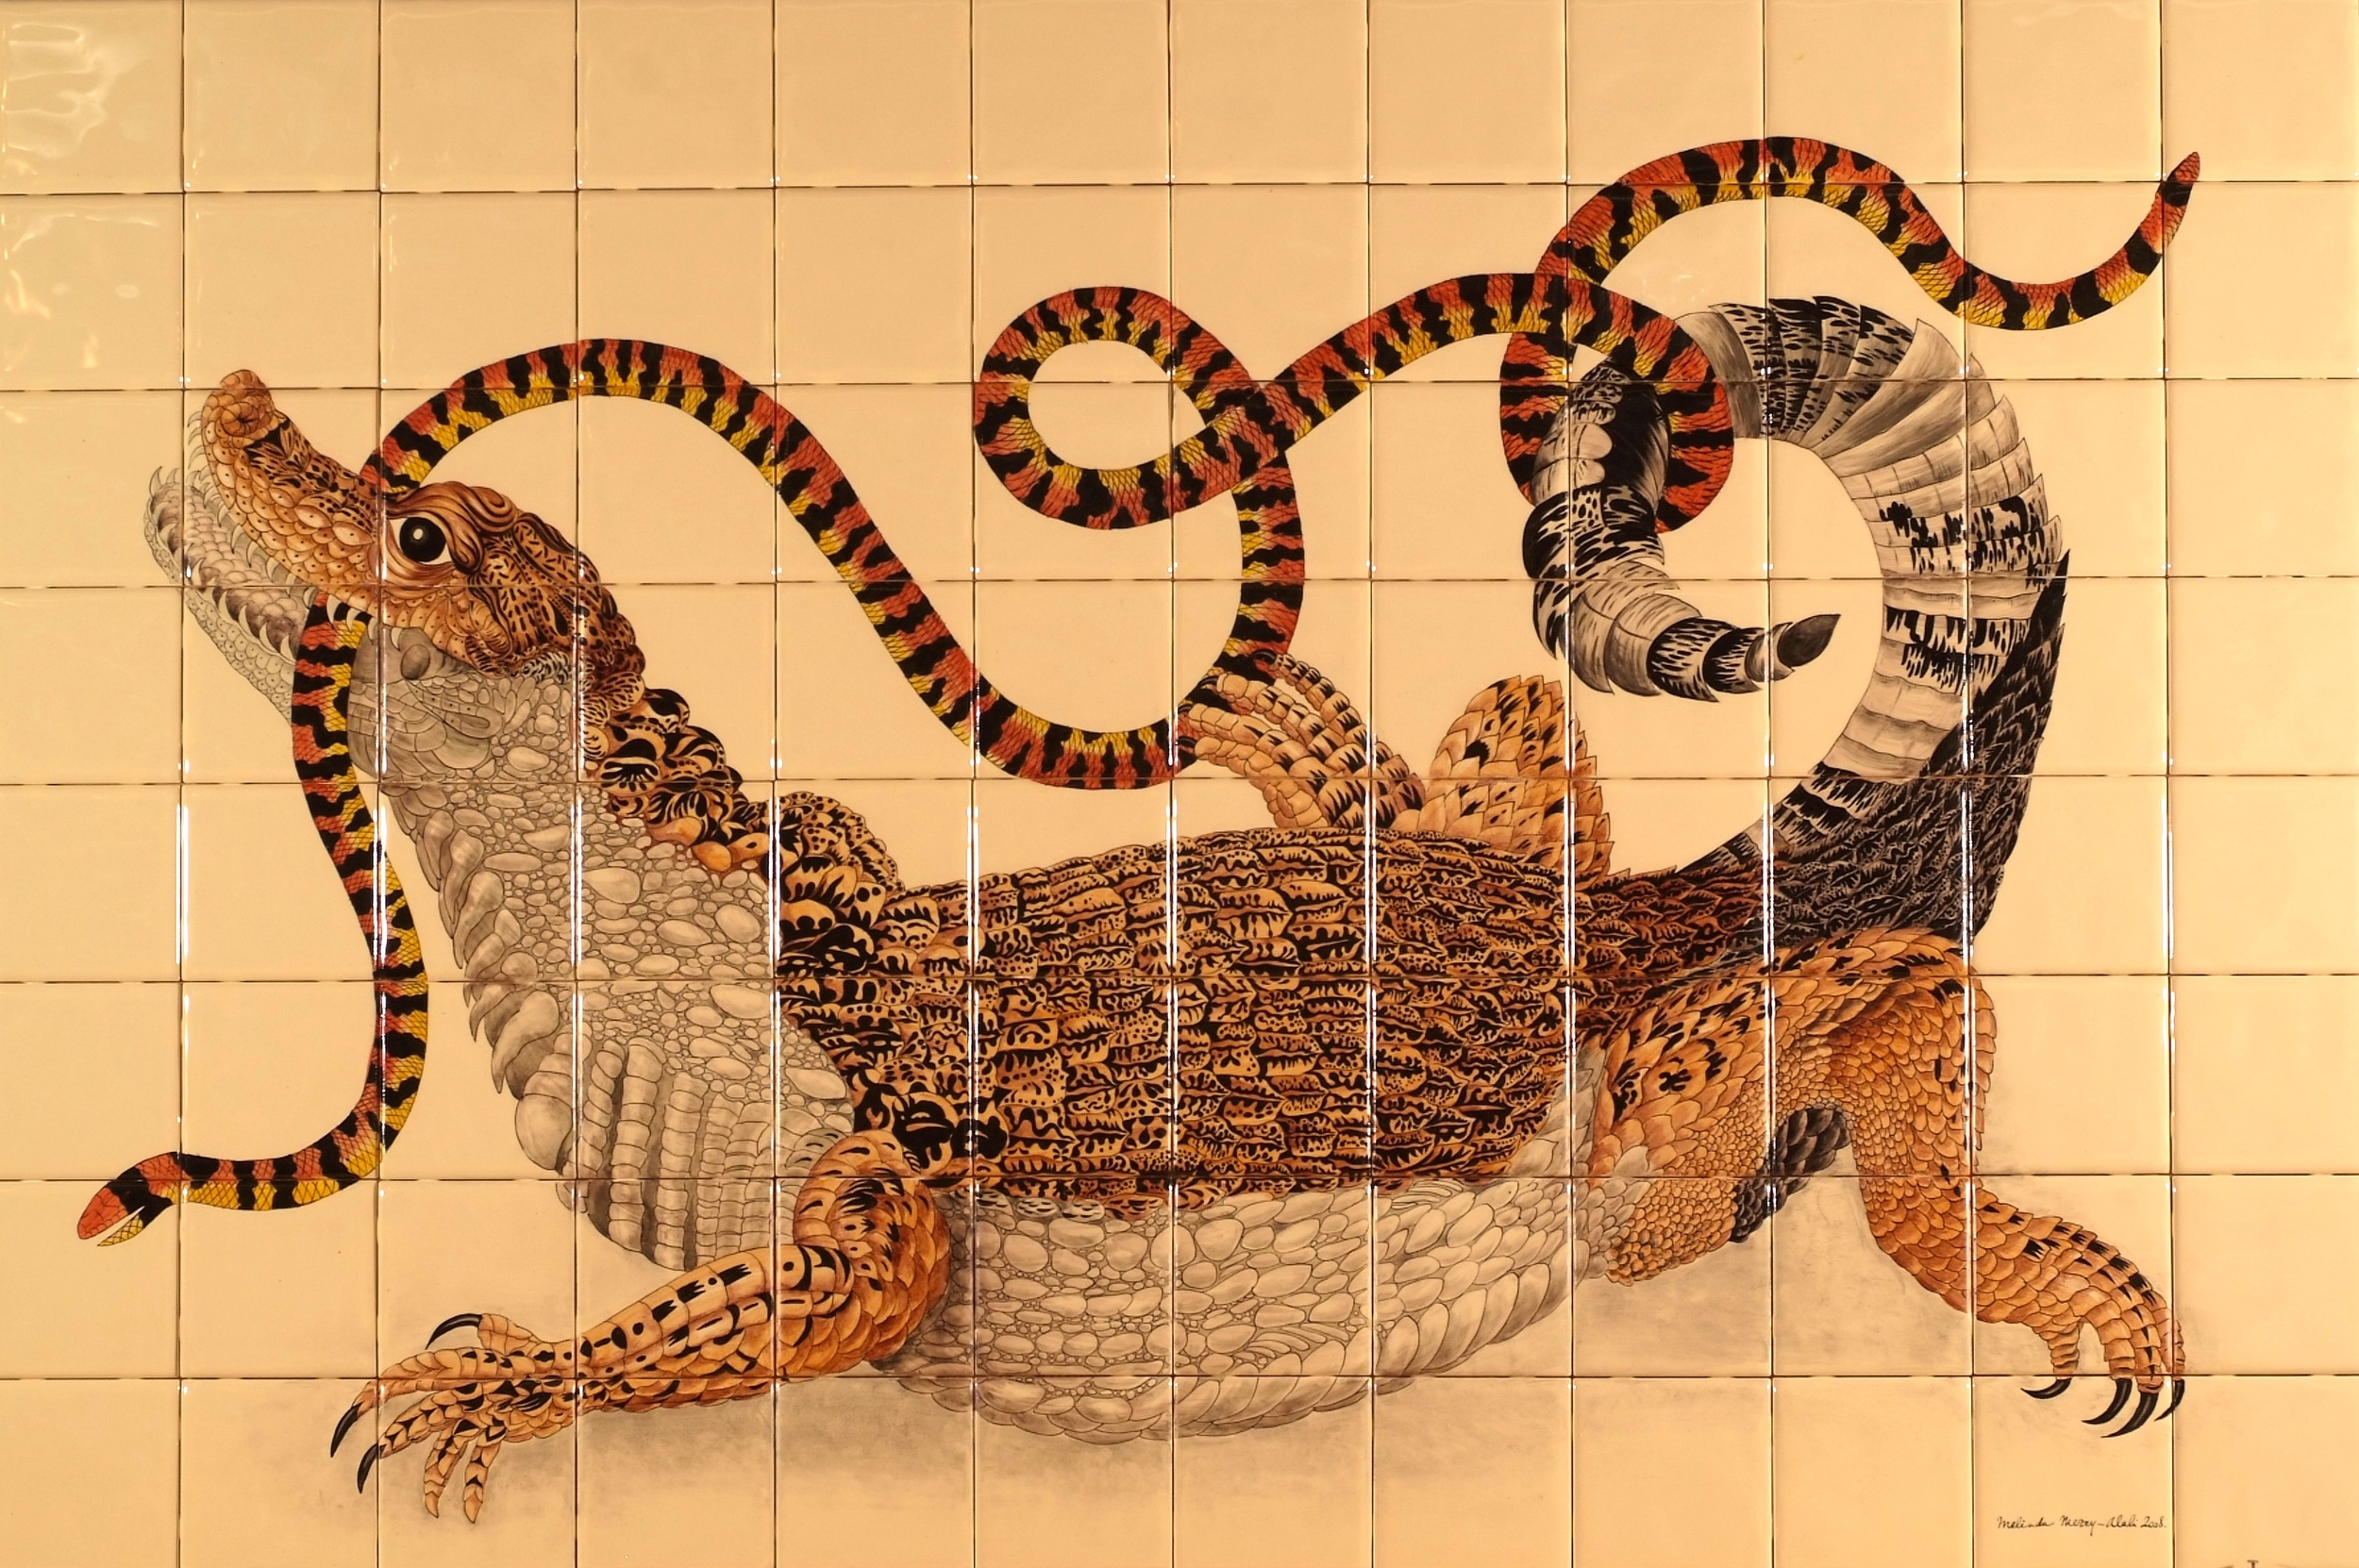 Alligator  - 34 x 51 in, 87 x 130 cm